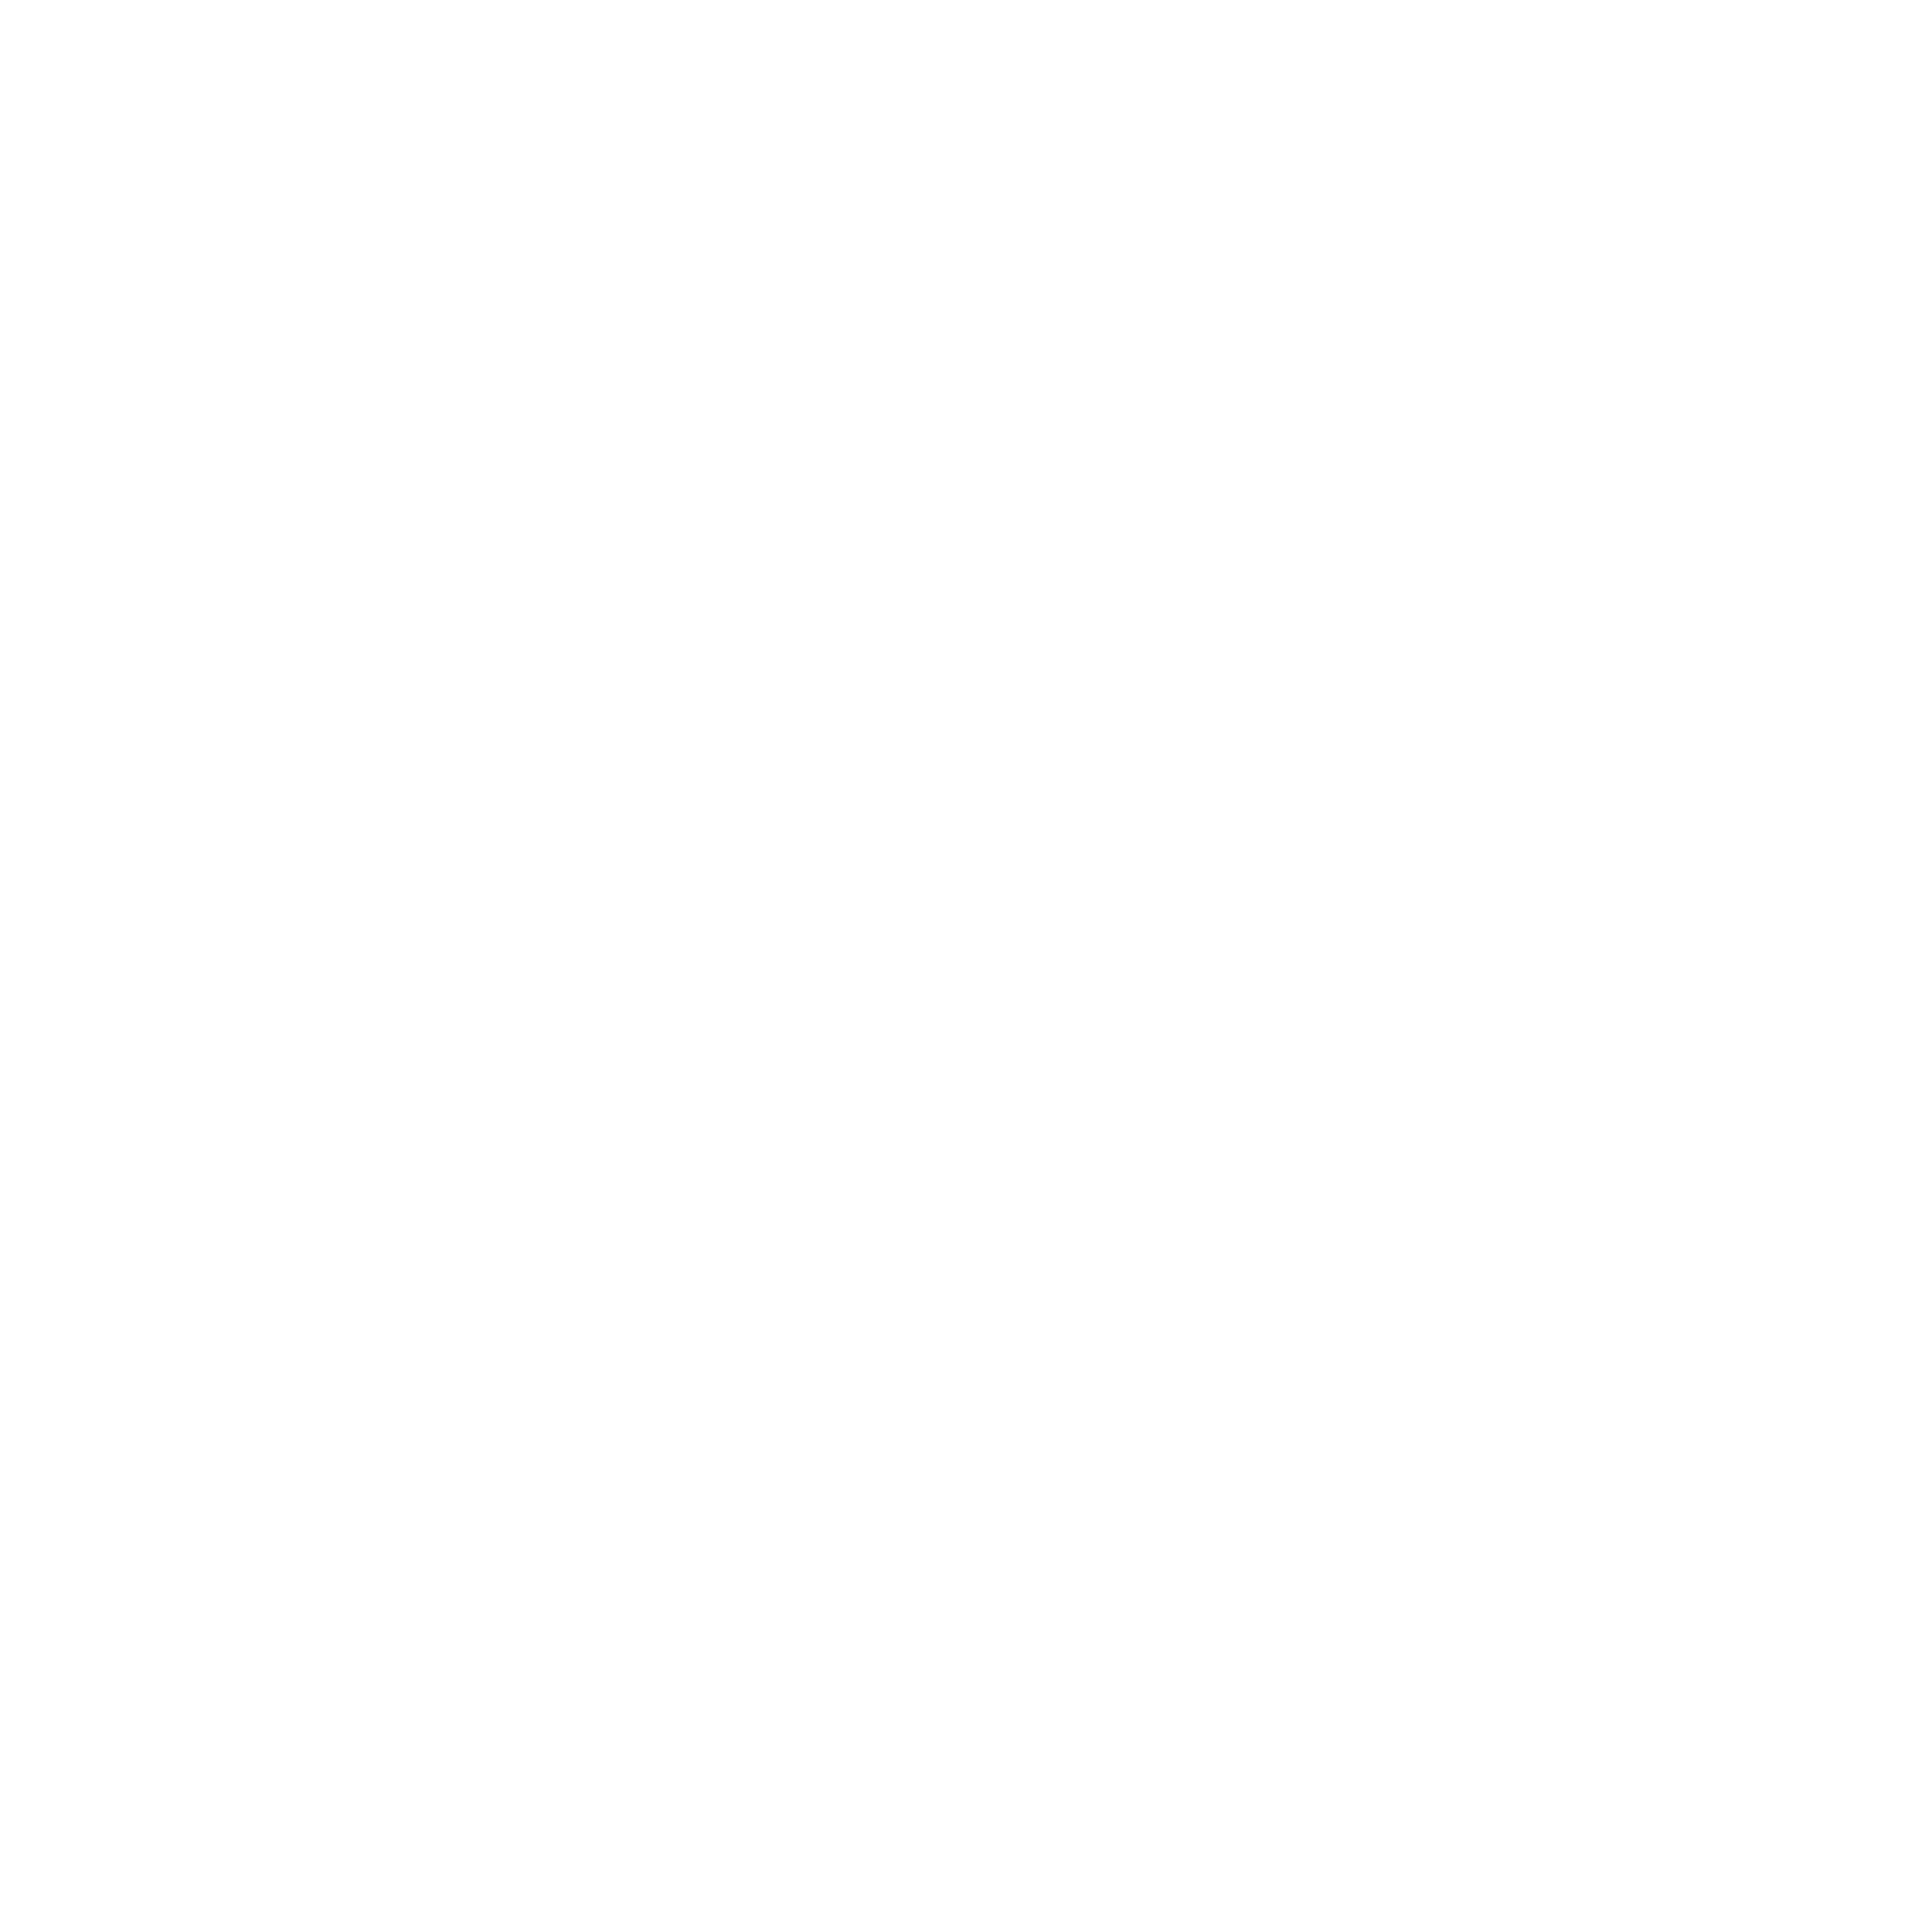 bupa-logo-black-and-white